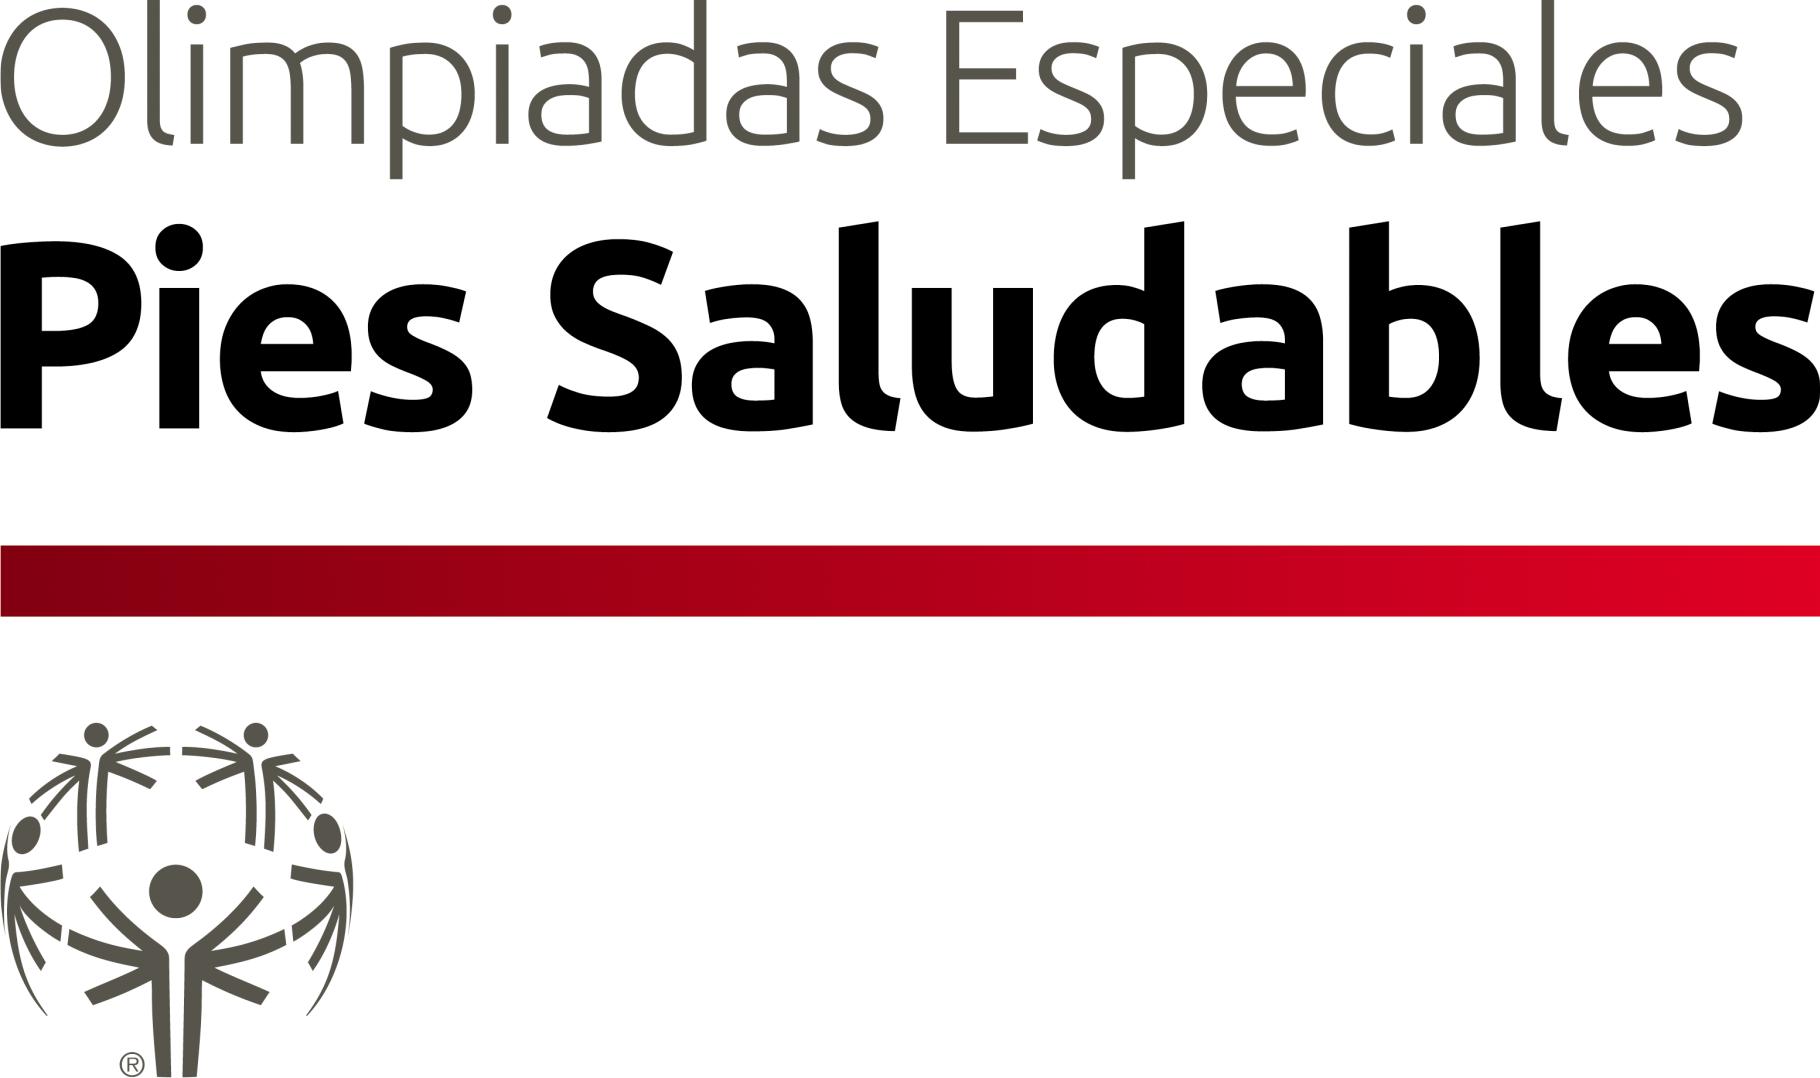 Pies Saludables - CMYK.PNG